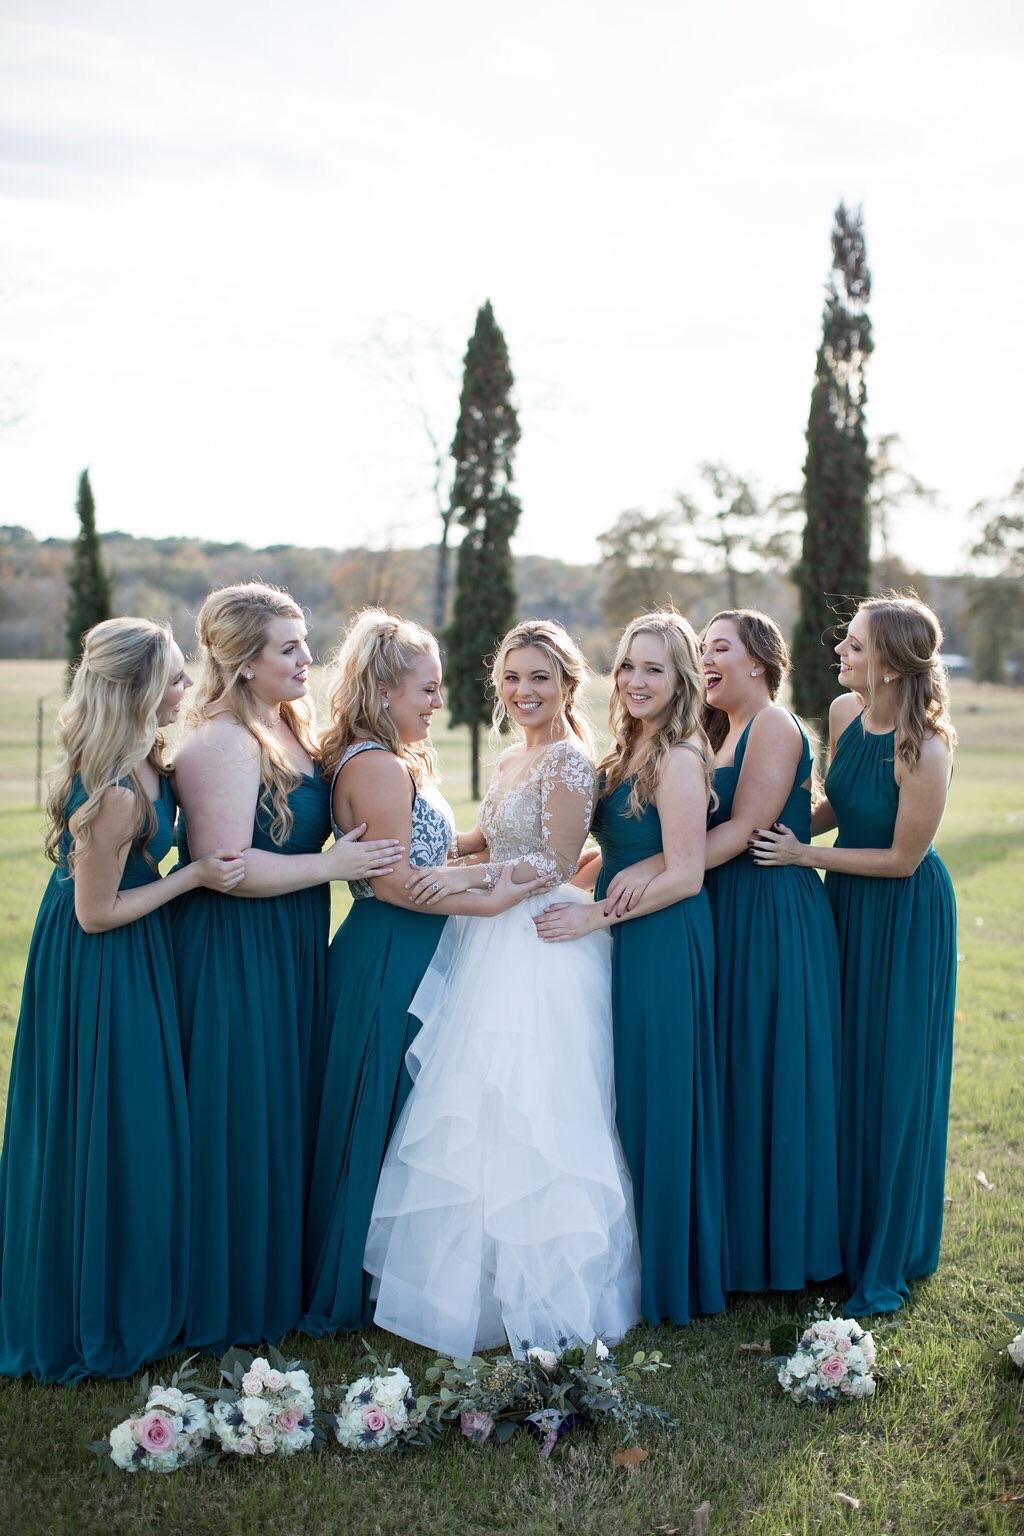 Azazie kailyn bridesmaid dress azazie azazie kailyn azazie kailyn azazie kailyn ombrellifo Image collections